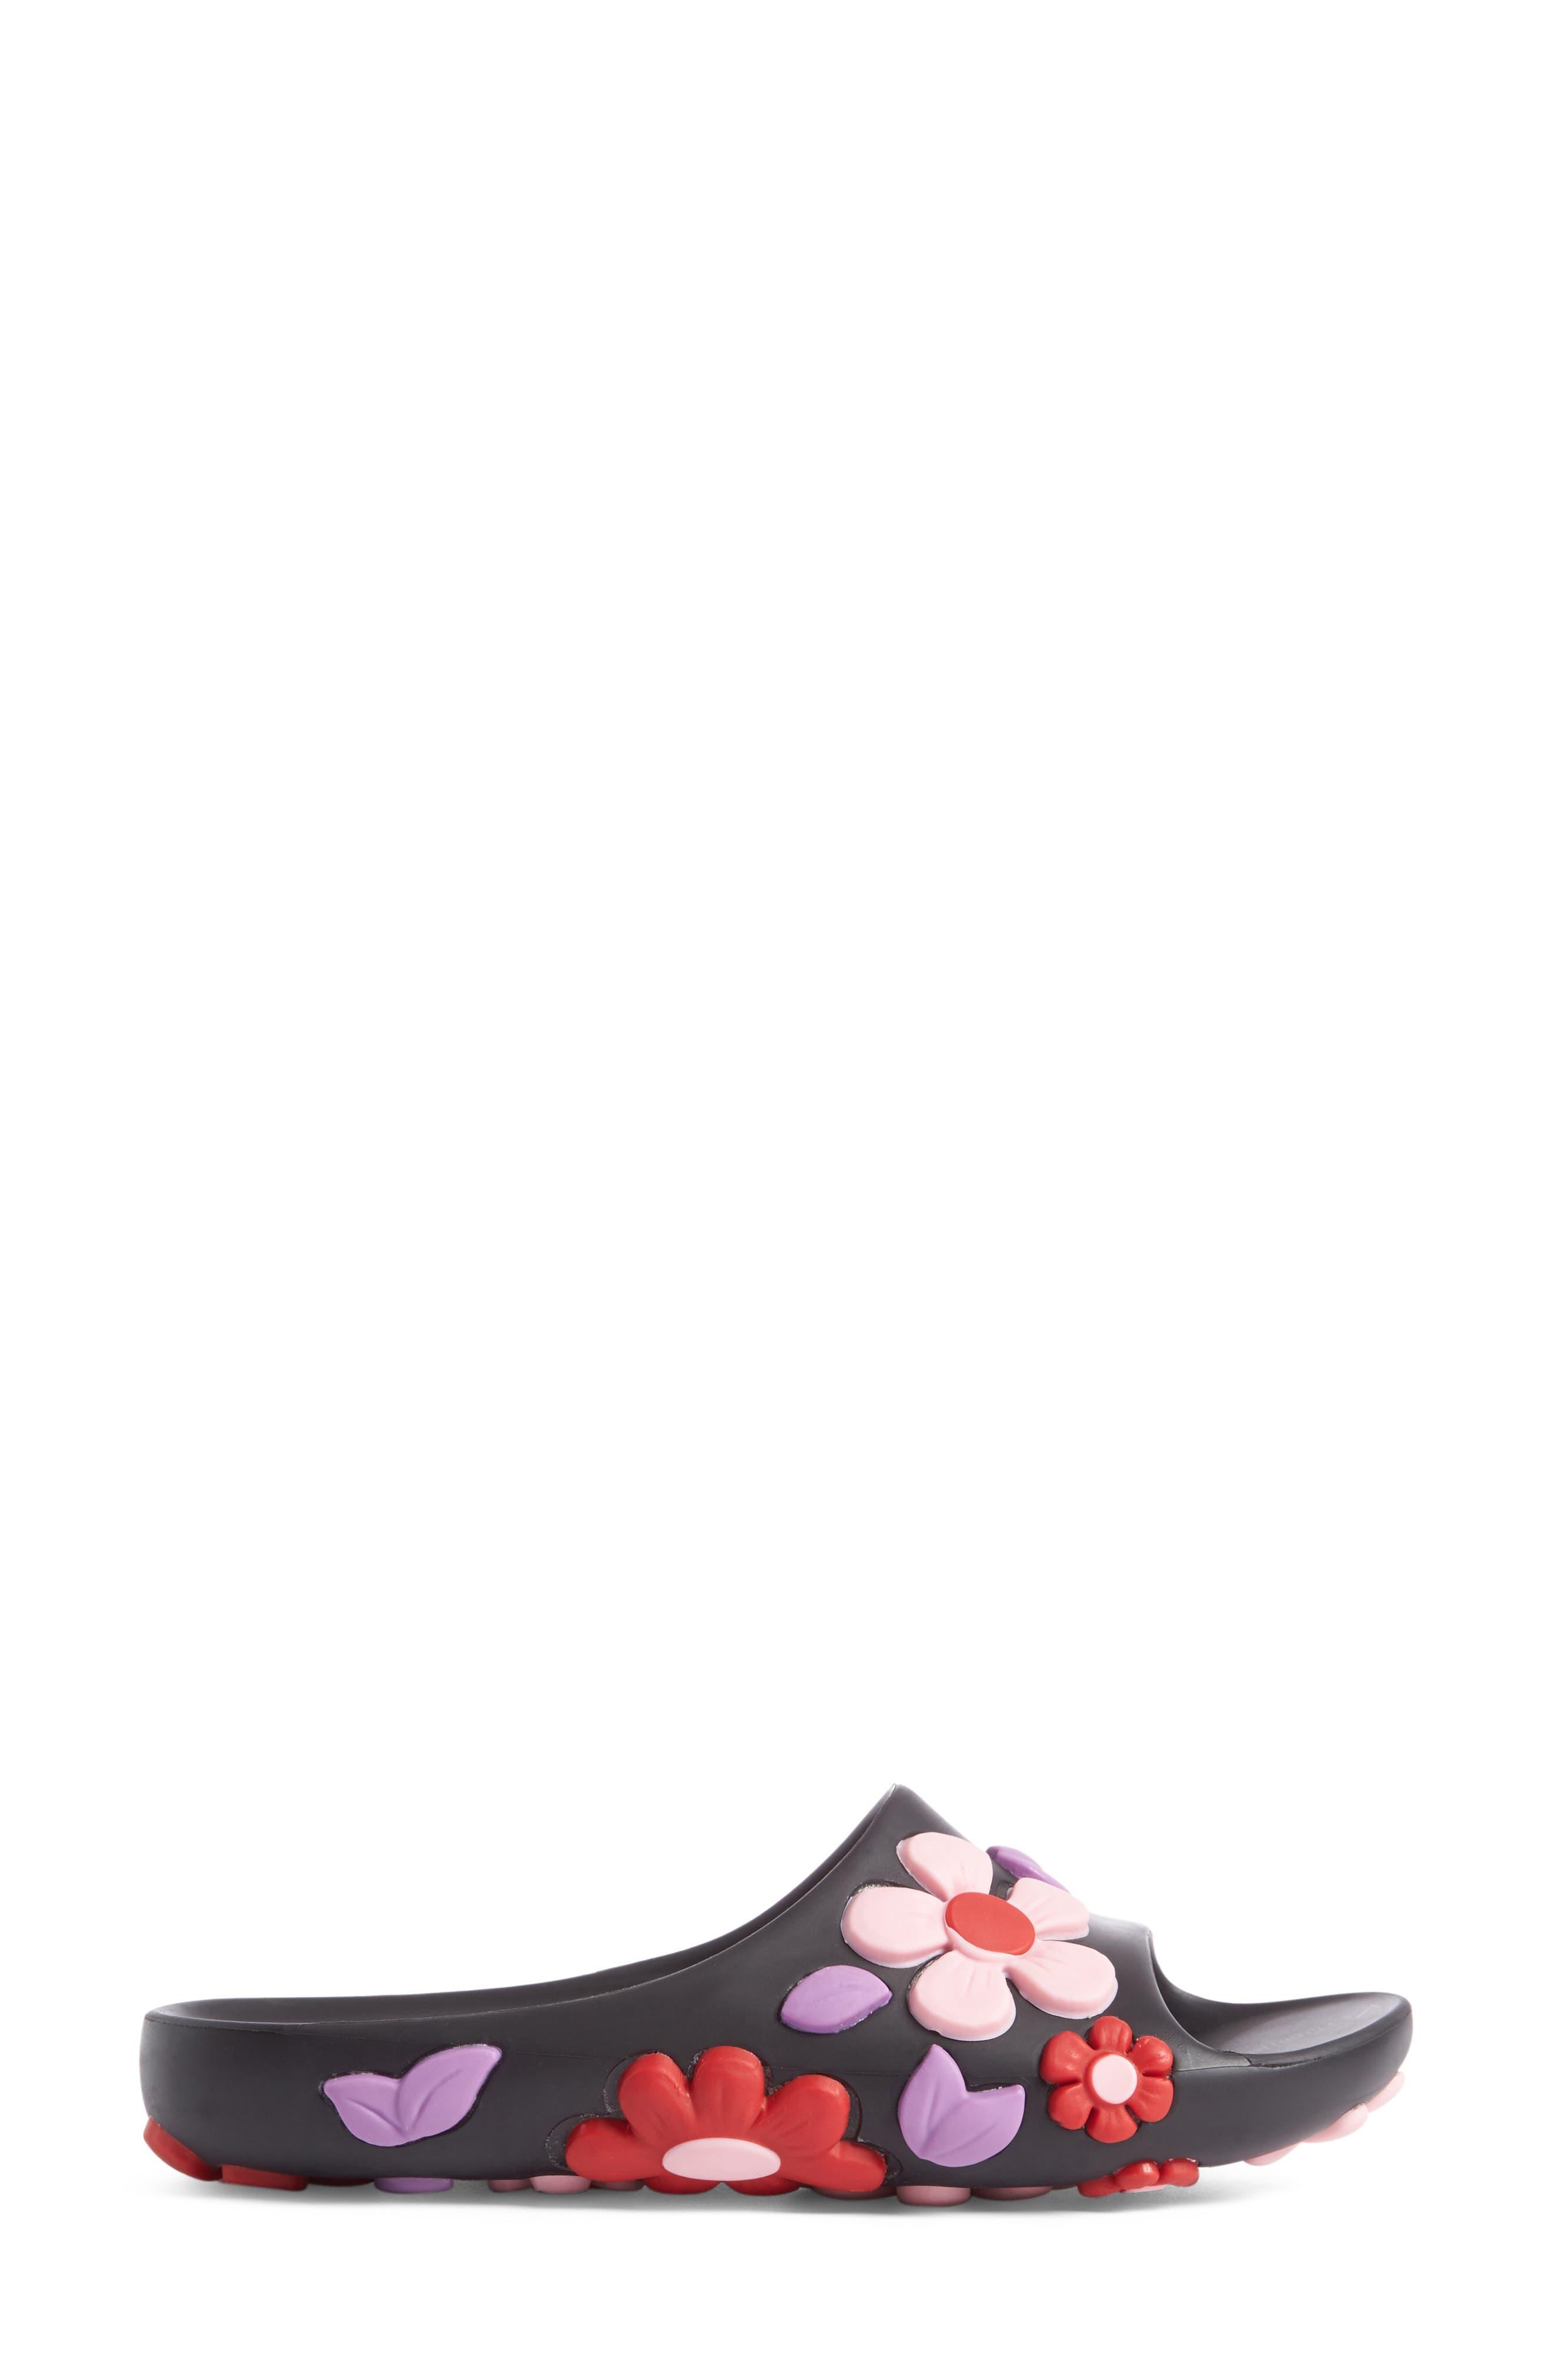 Floral Slide Sandal,                             Alternate thumbnail 3, color,                             001